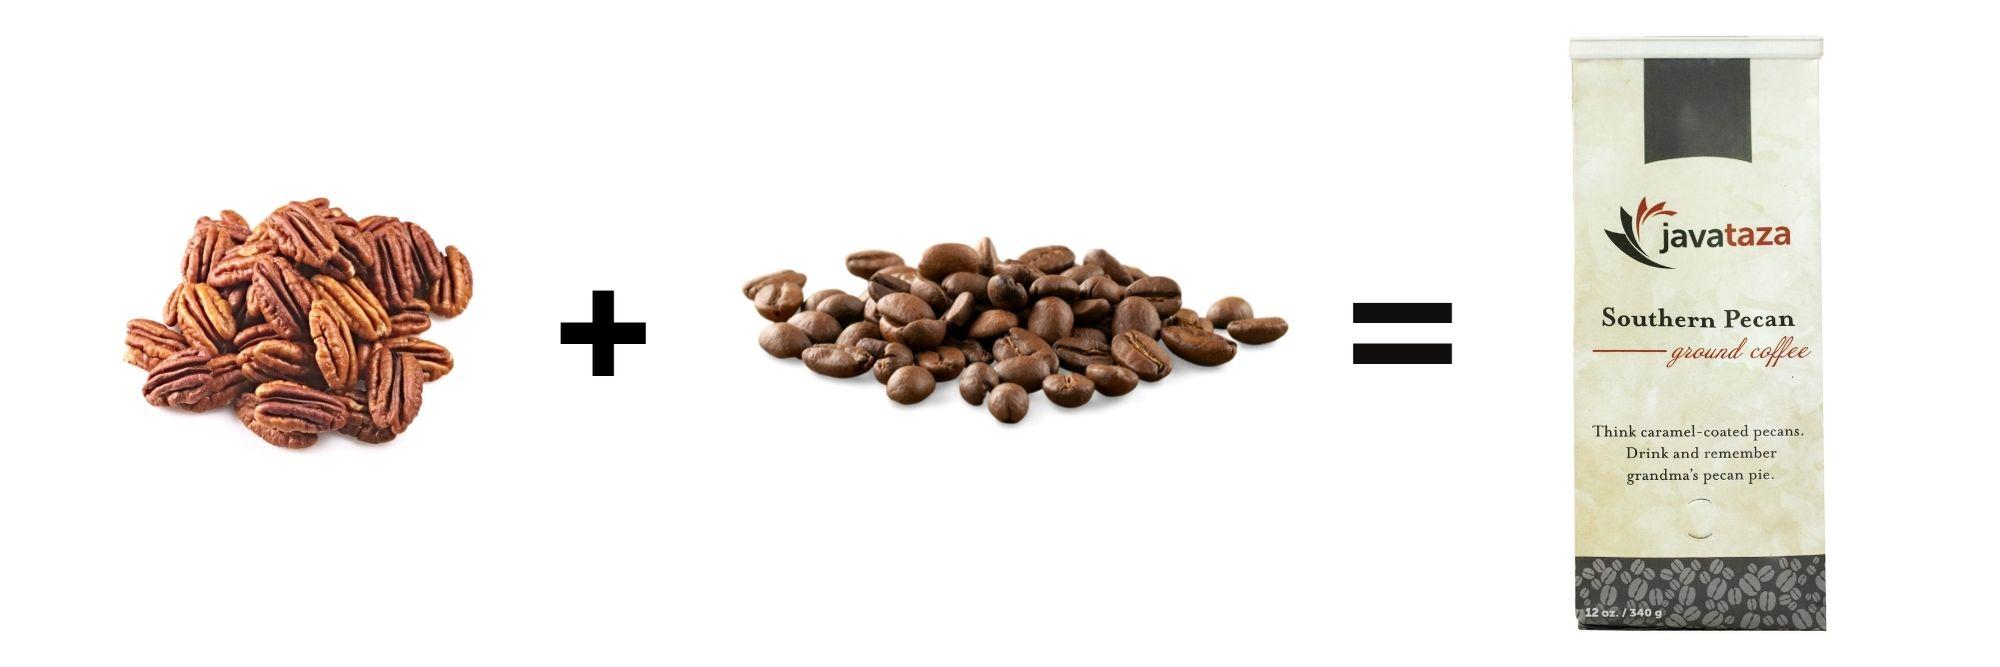 southern pecan direct trade coffee